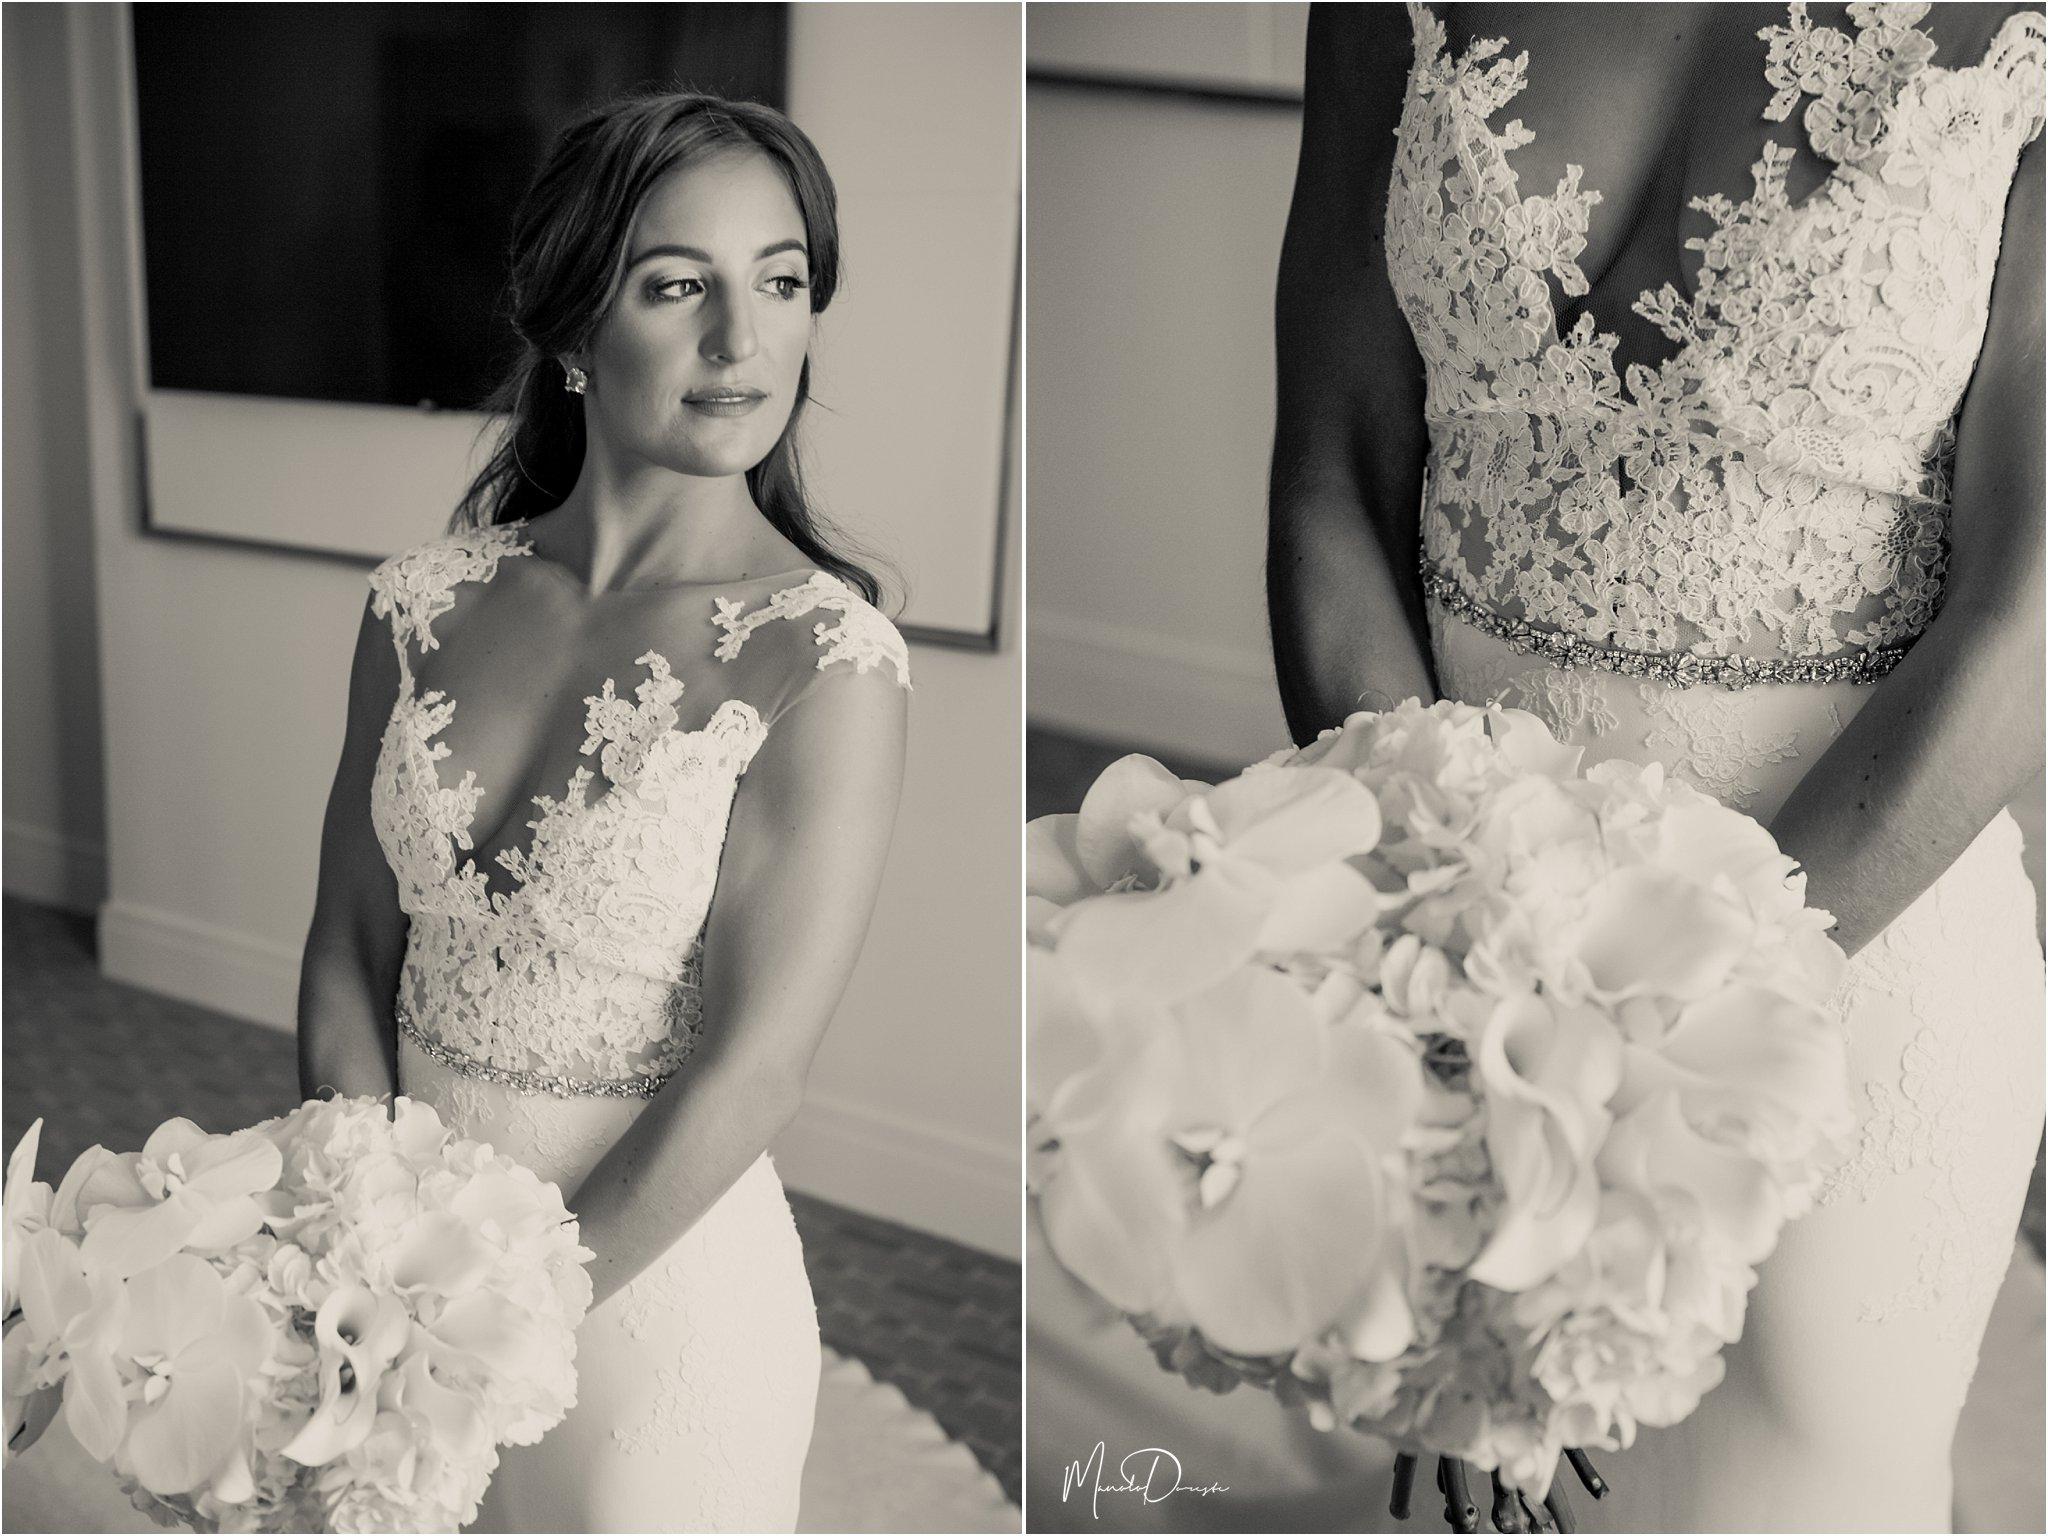 0313_ManoloDoreste_InFocusStudios_Wedding_Family_Photography_Miami_MiamiPhotographer.jpg